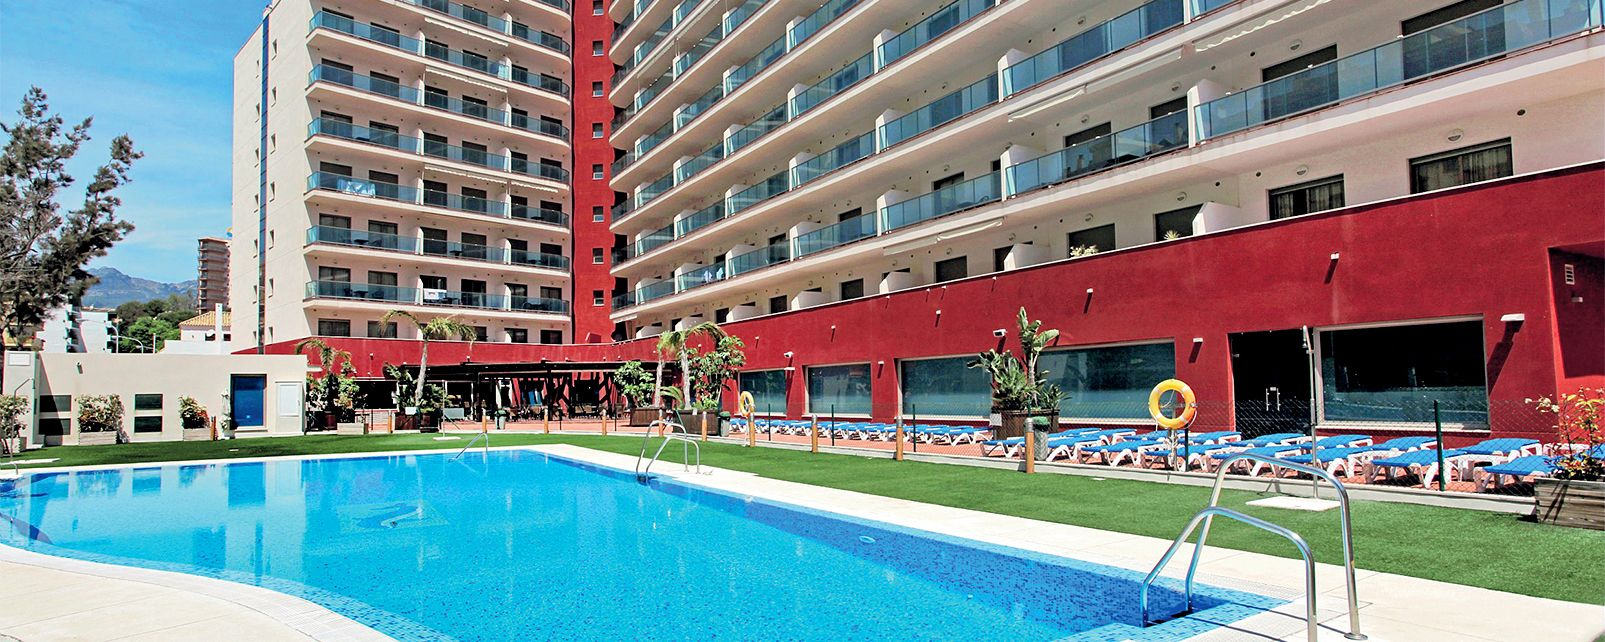 Hotel Pierre et Vacances Benalmadena Principe